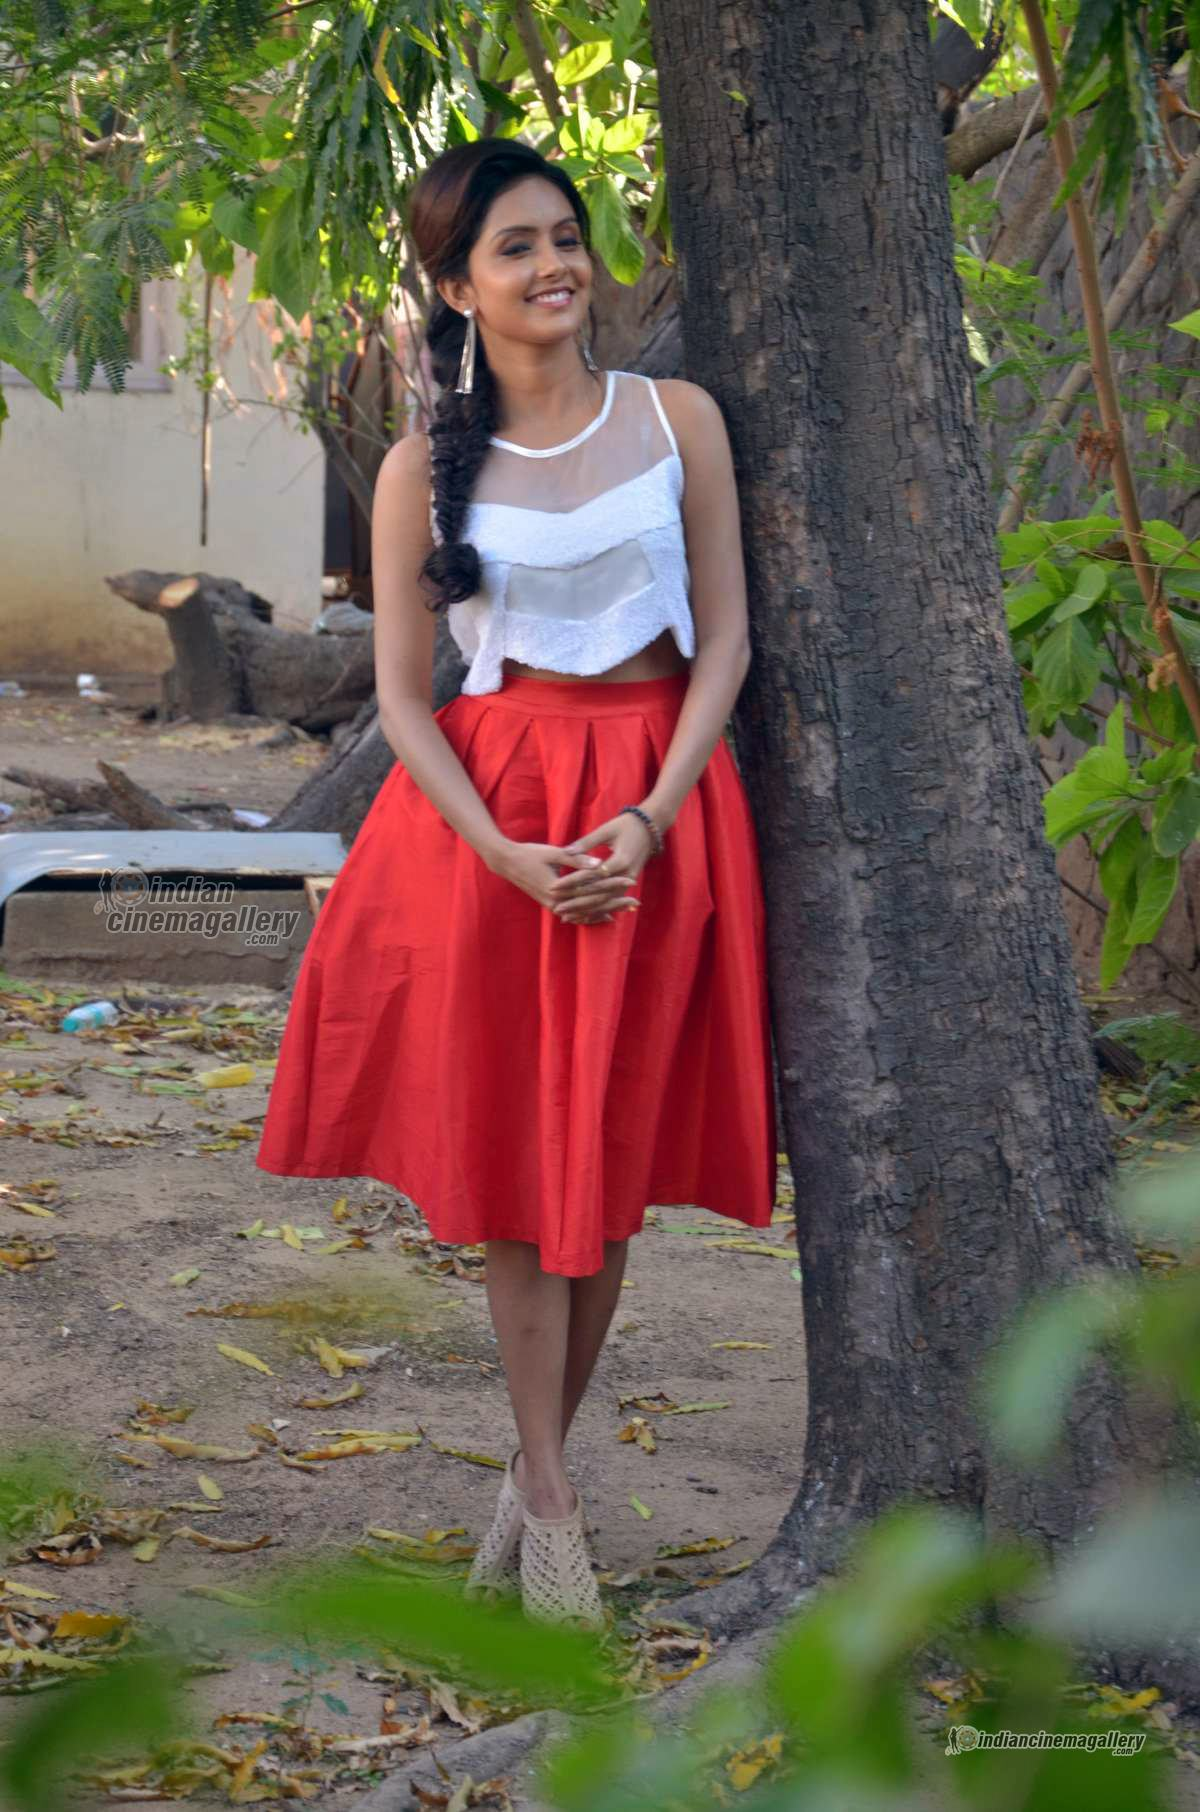 mahima-nambiar-at-kuttram-23-movie-press-meet-photos-16638